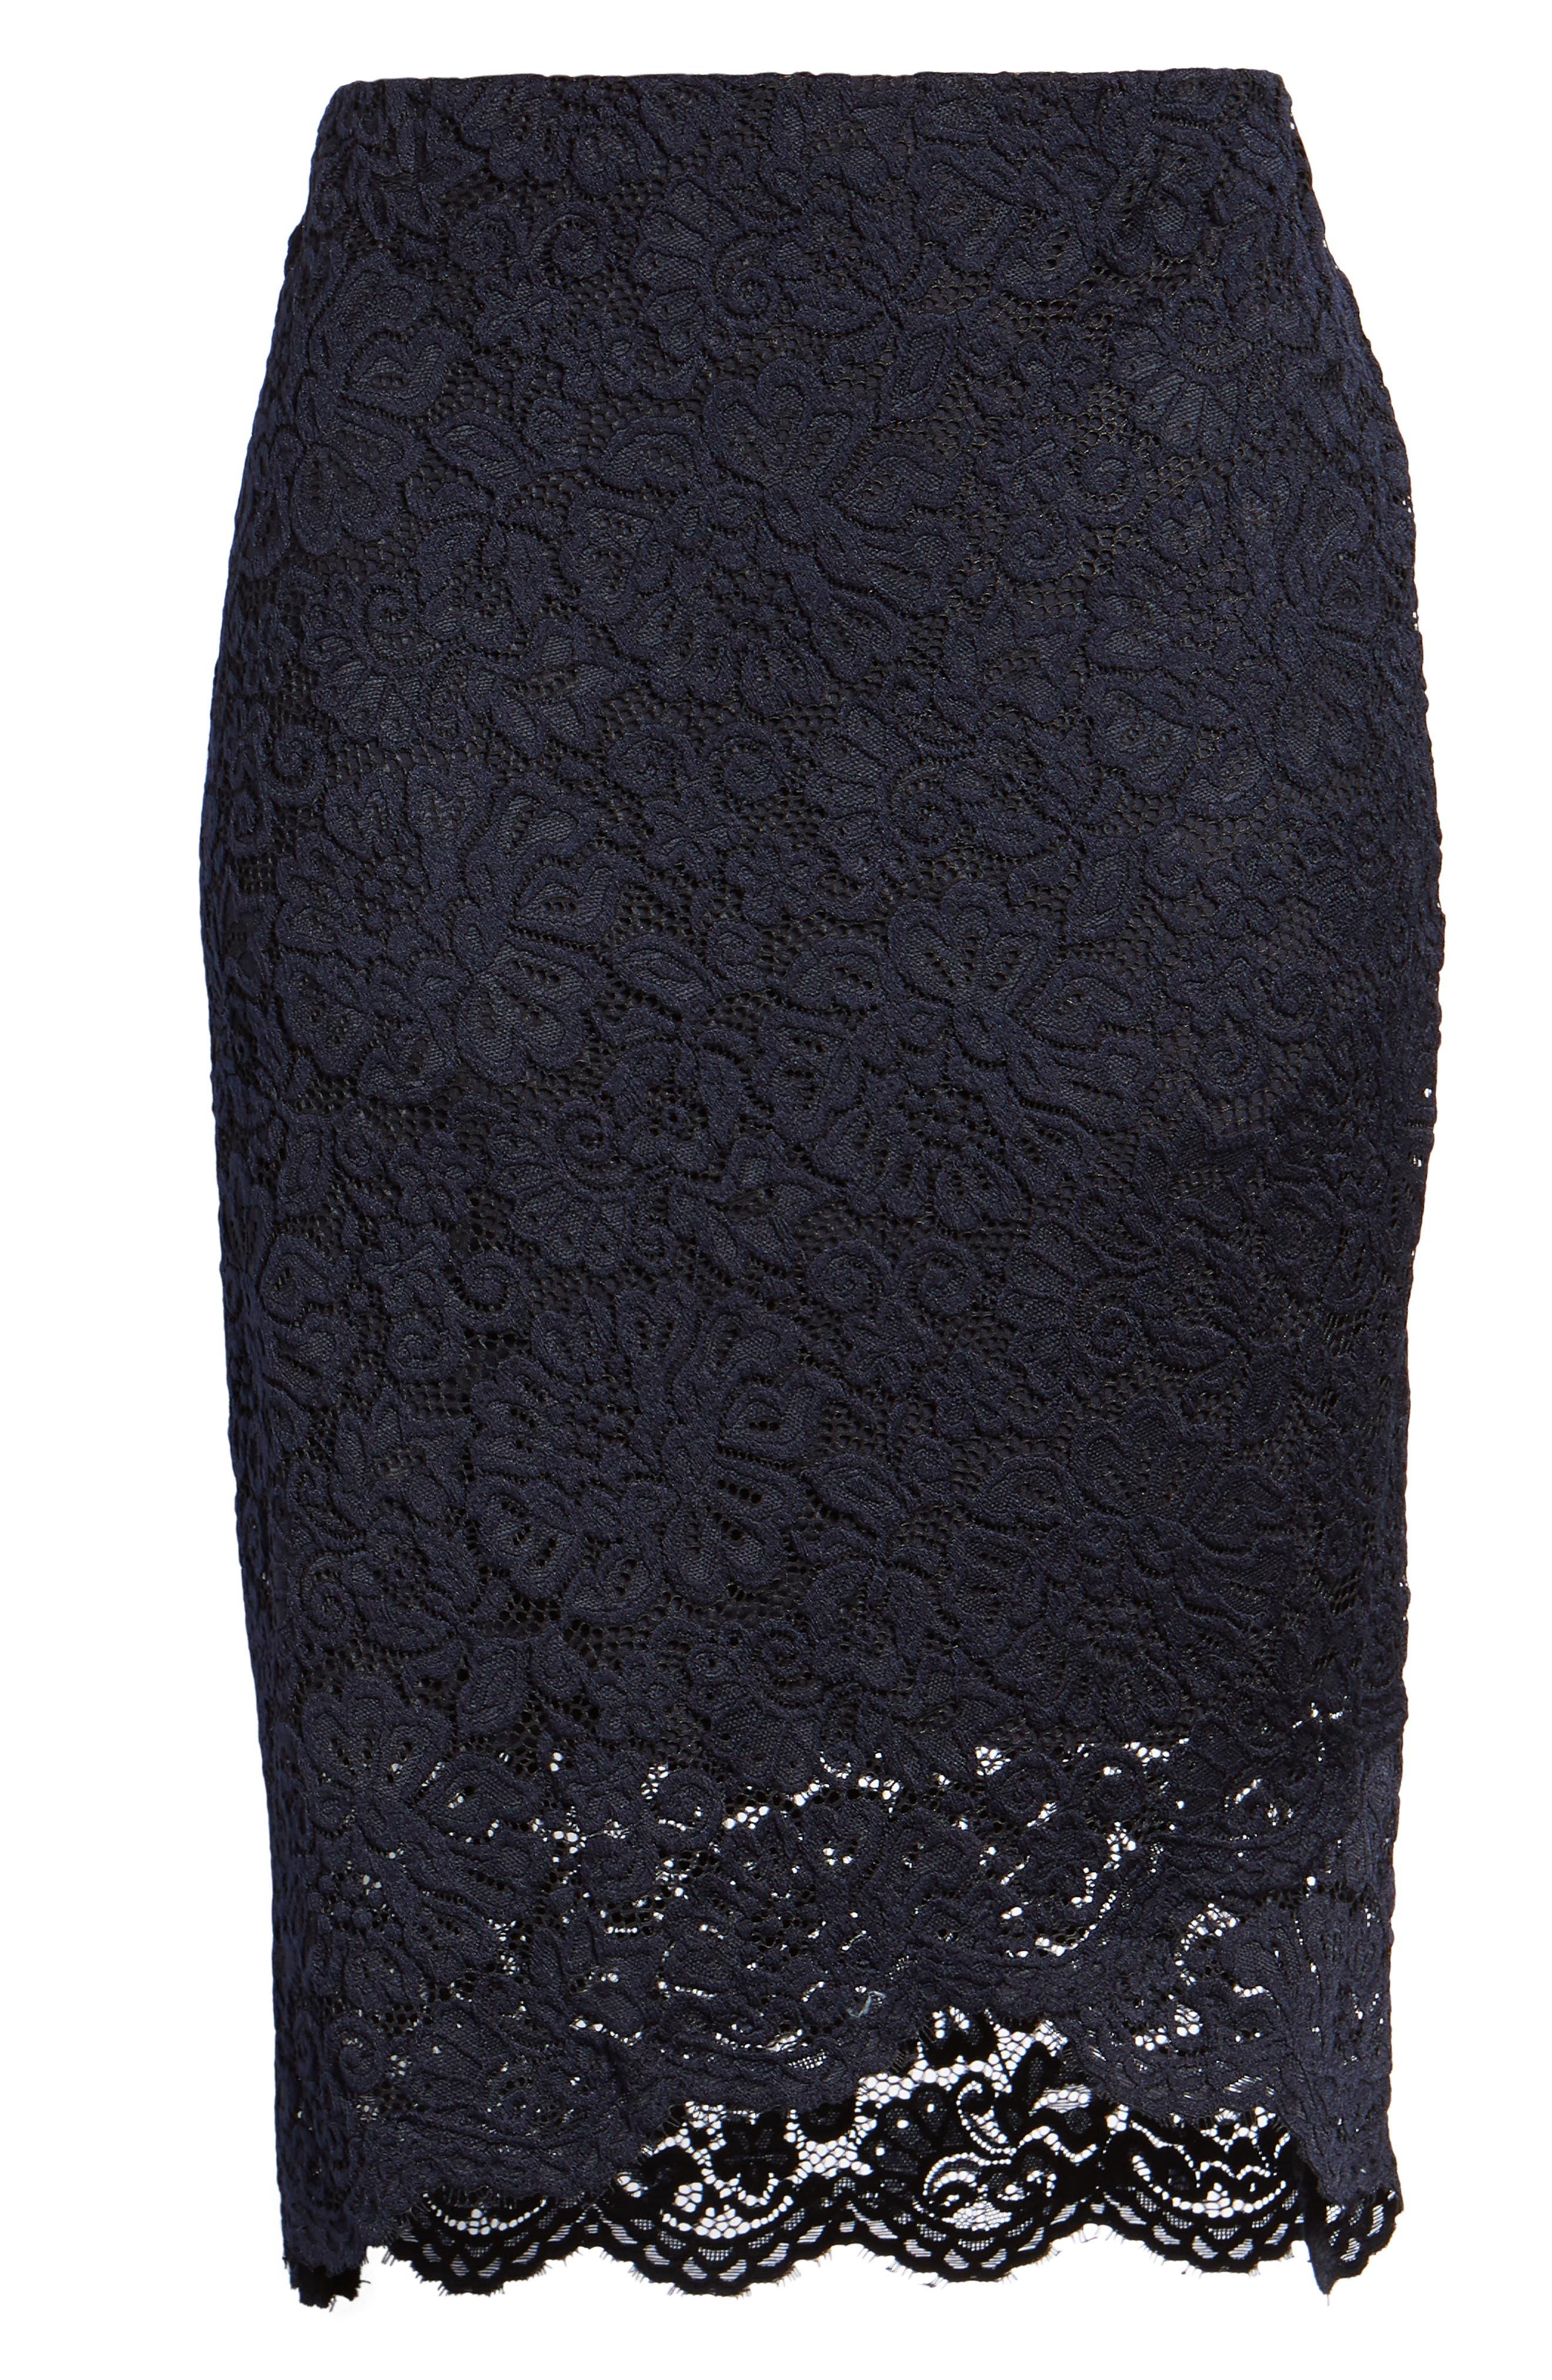 ROSEMUNDE, Lace Pencil Skirt, Alternate thumbnail 6, color, 001